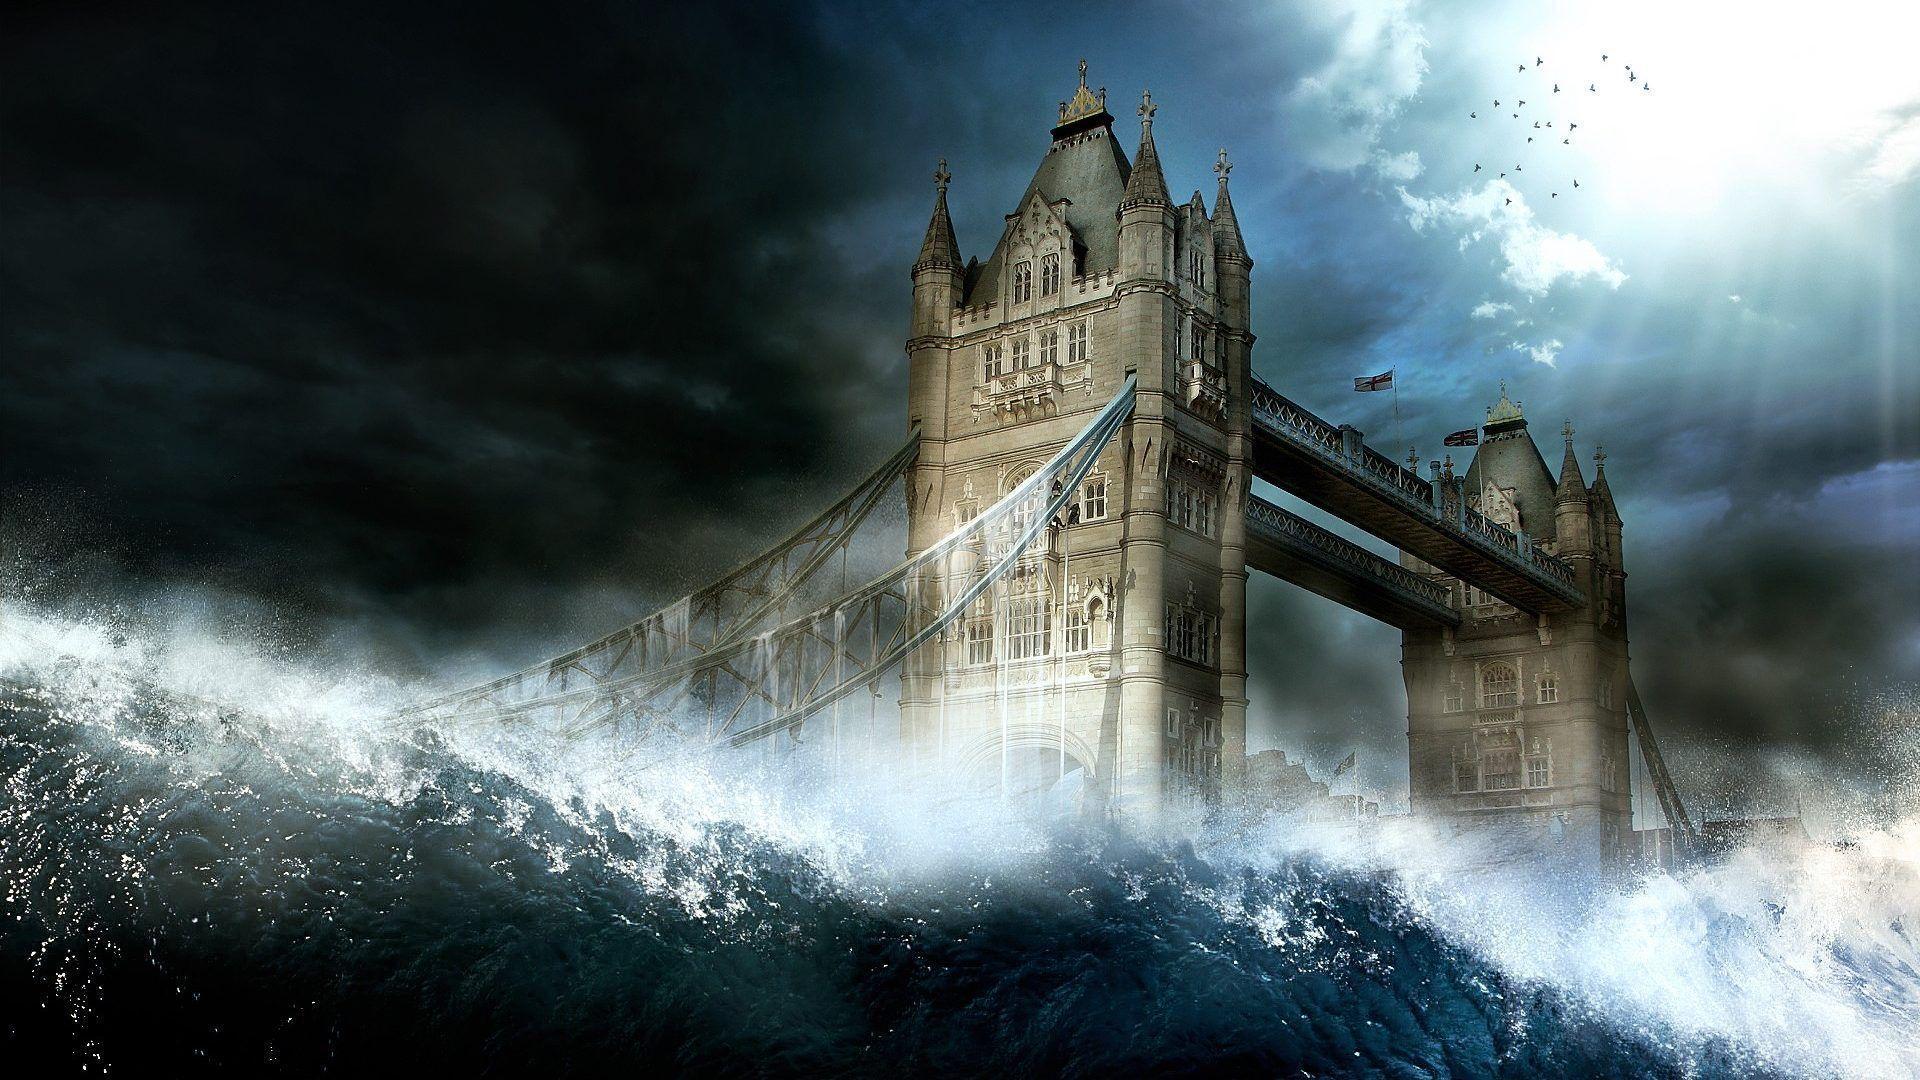 Disaster Tag wallpapers: Flood Waves London Bridge Calamity Cool .